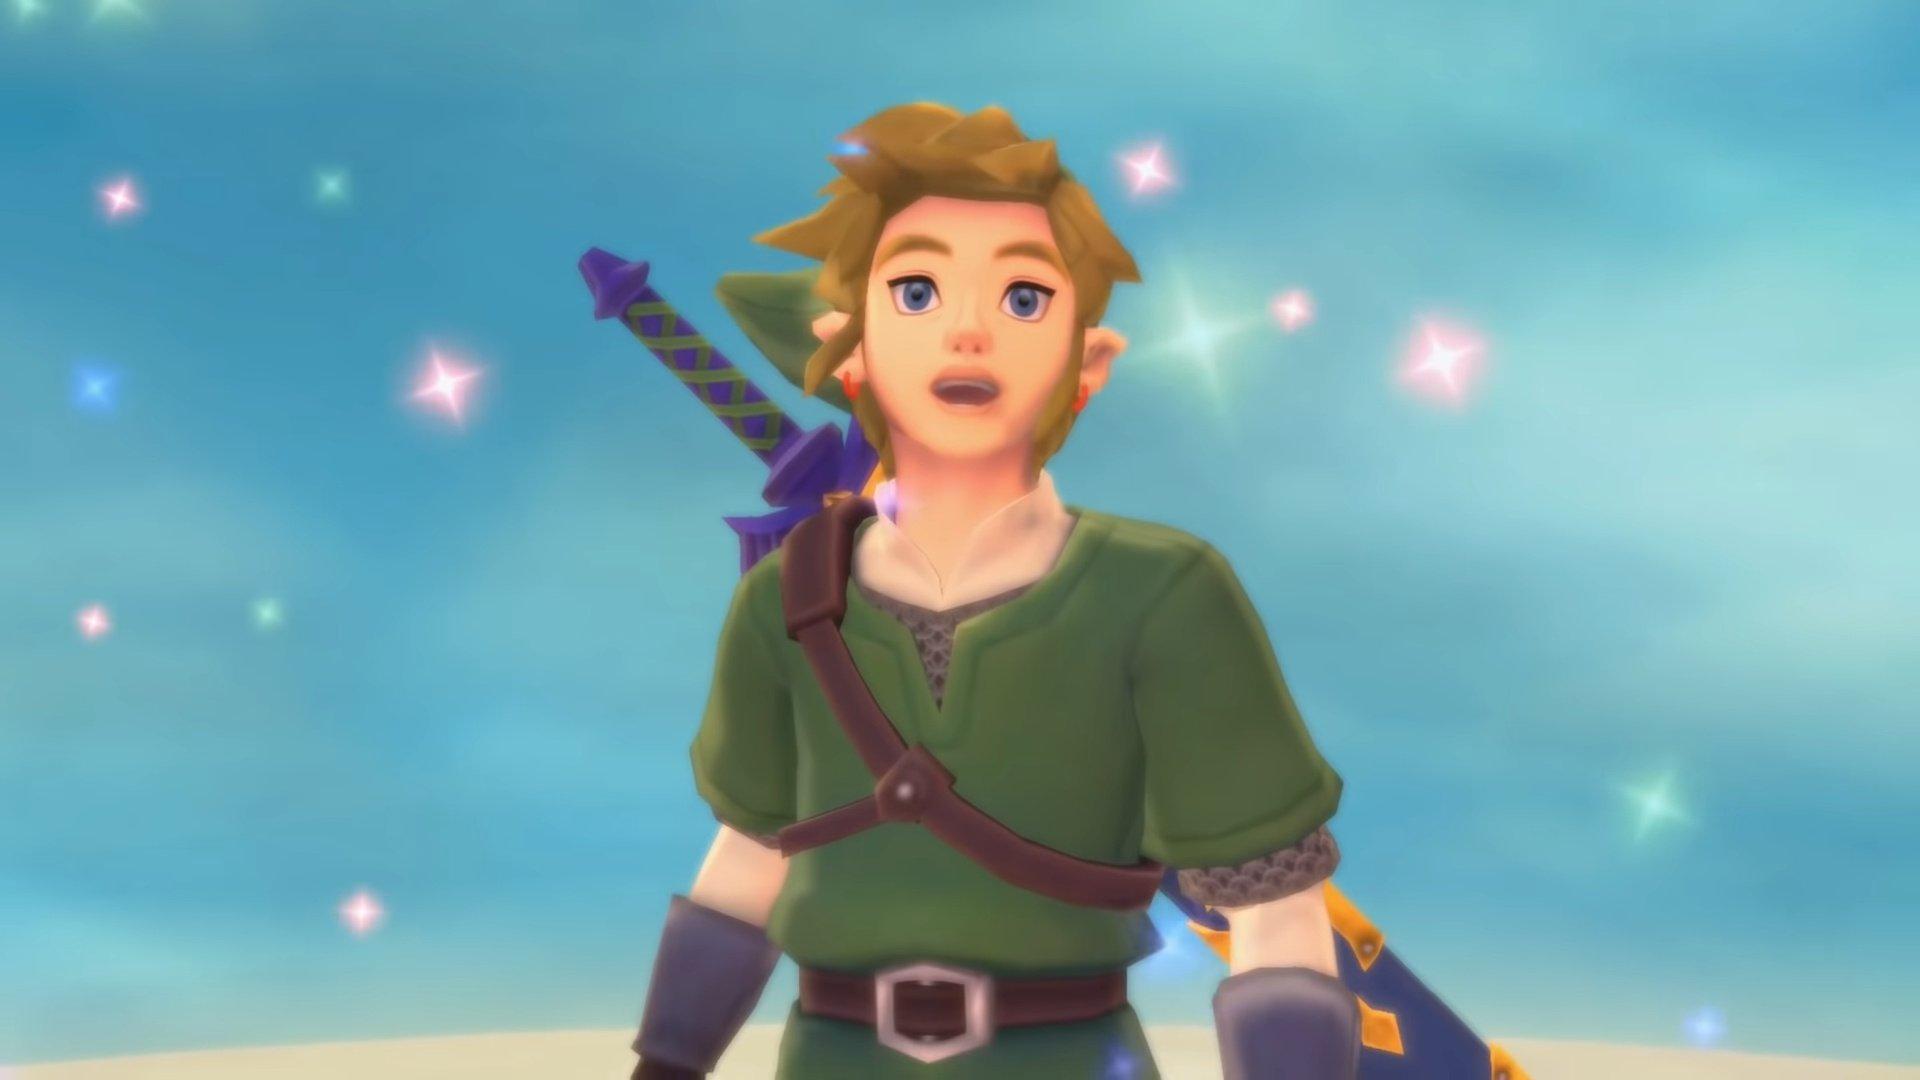 Neste Guia Definitivo de Zelda: Skyward Sword HD para o Nintendo Switch, iremos te mostrar como conseguir TODOS os Gratitude Crystals no game, e suas recompensas.